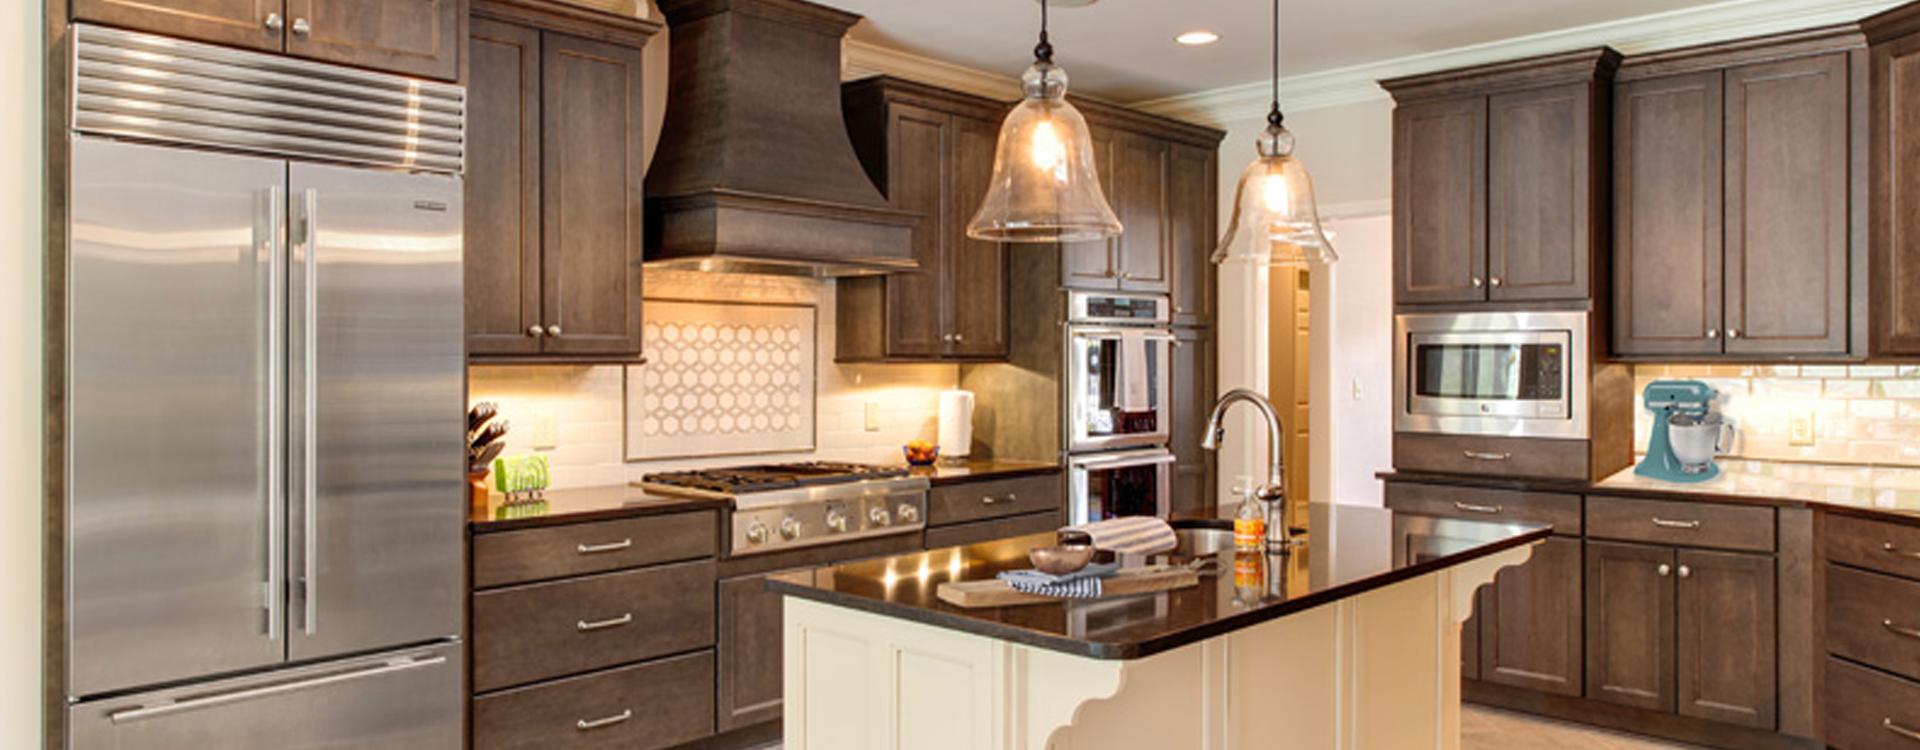 Wellborn Cabinet, Inc. Image